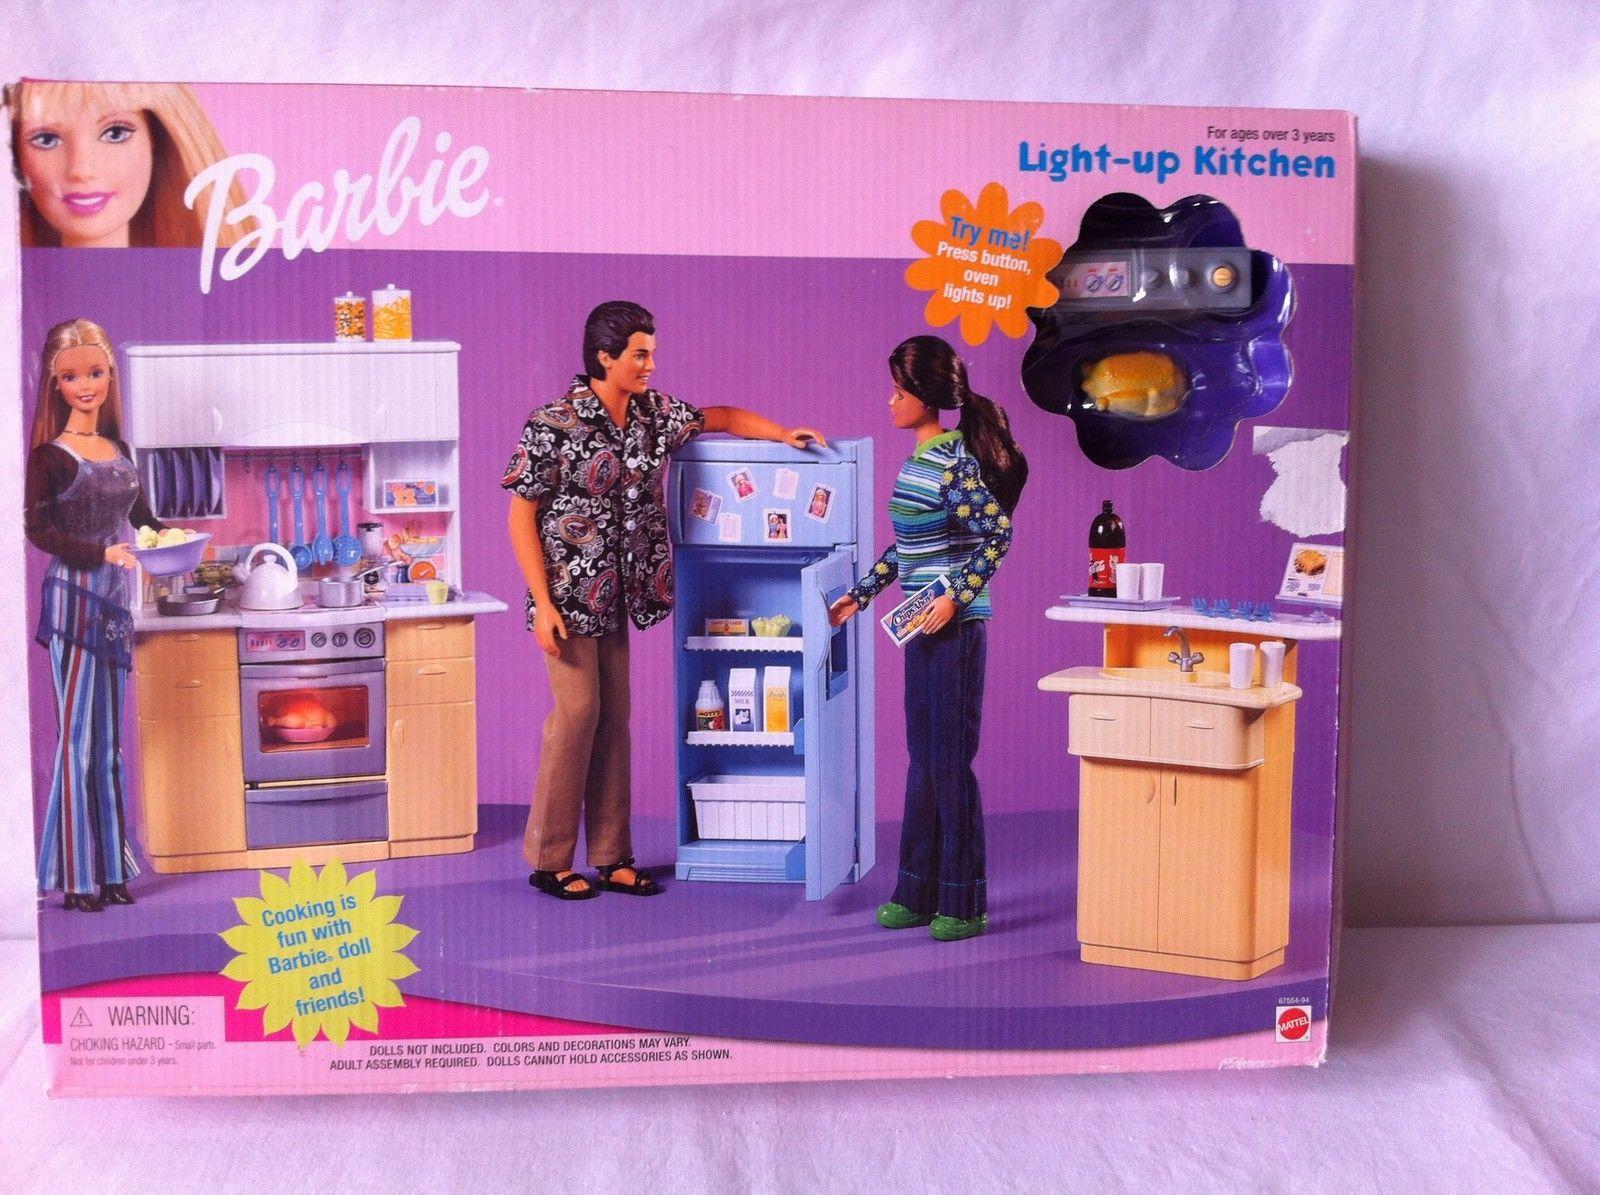 Barbie Kitchen Furniture Barbie Home Refrigerator And Cart Kitchen Playset By Mattel